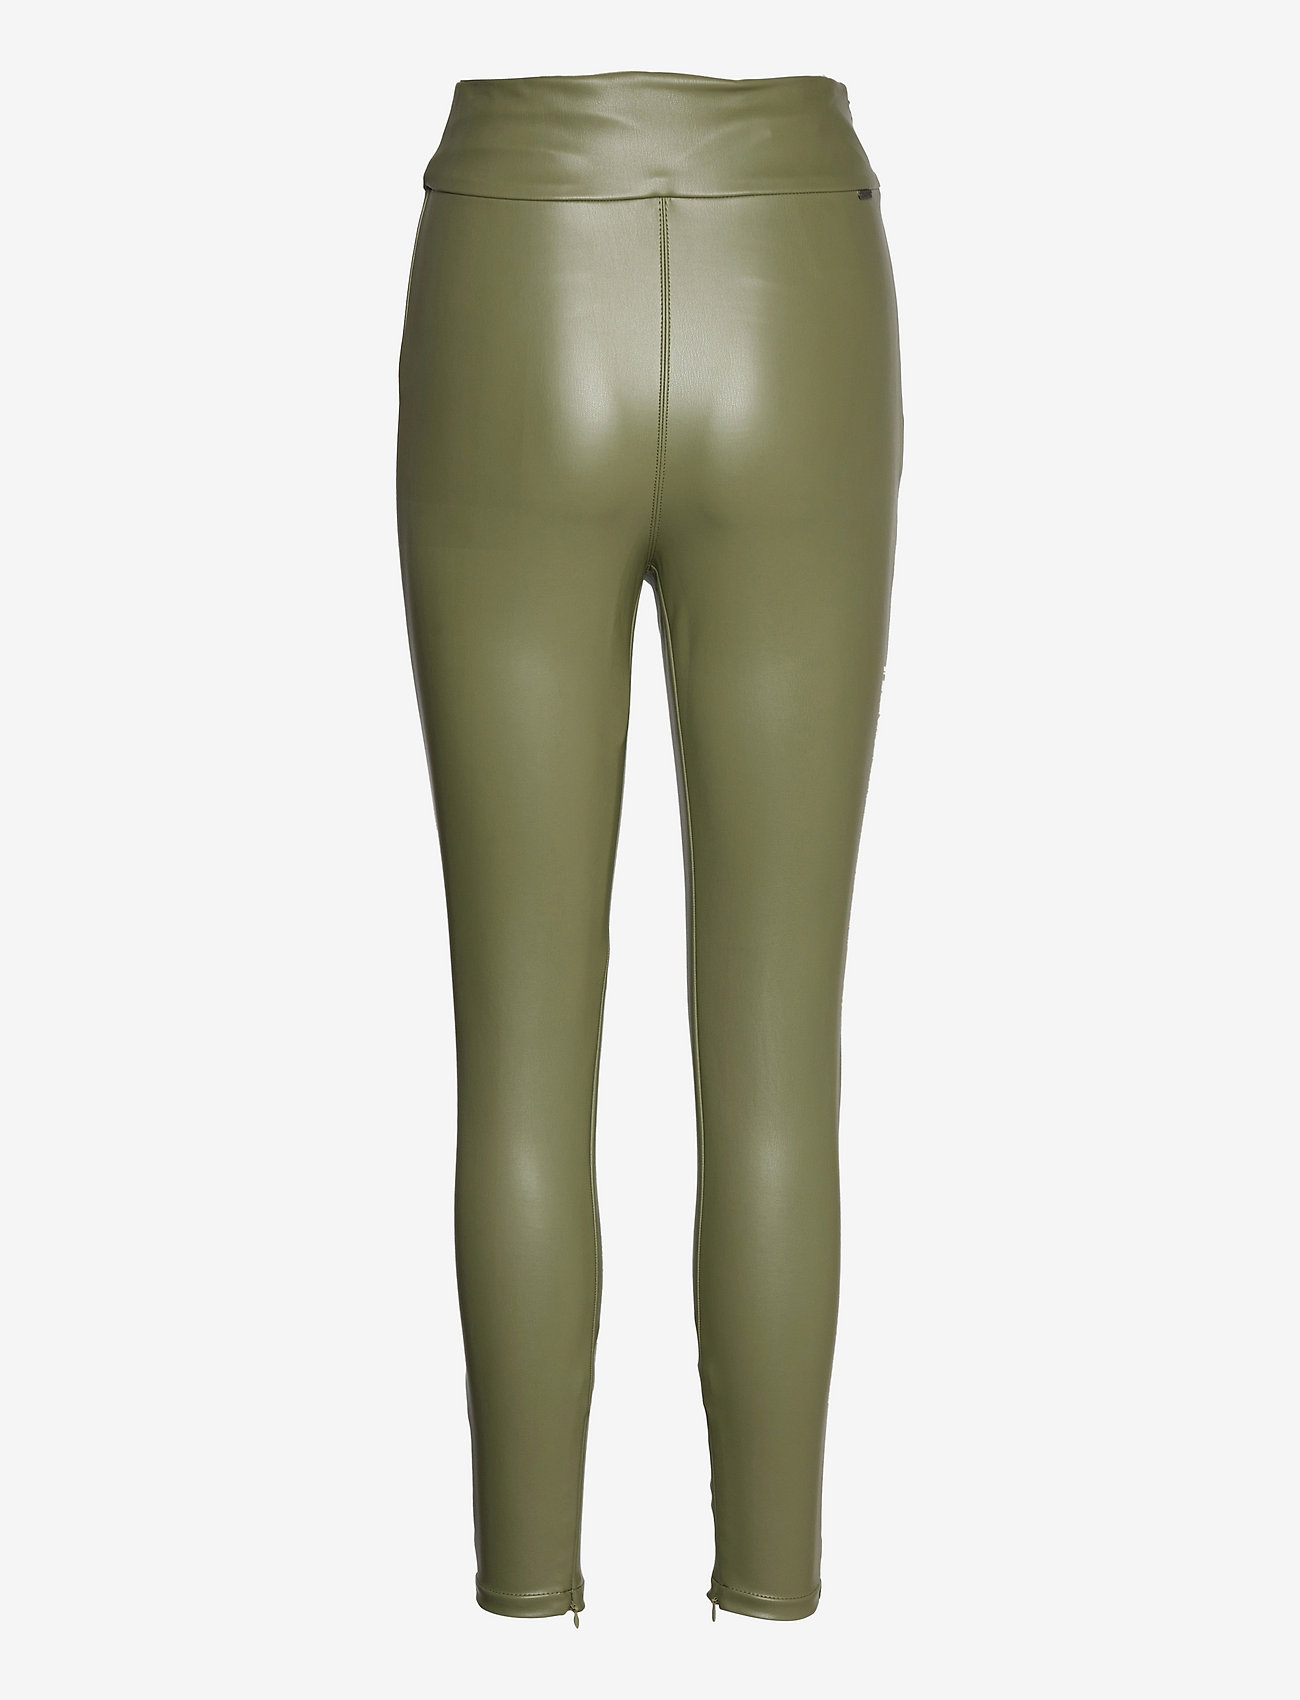 GUESS Jeans - PRISCILLA LEGGINGS - skinnbyxor - baja palm - 1